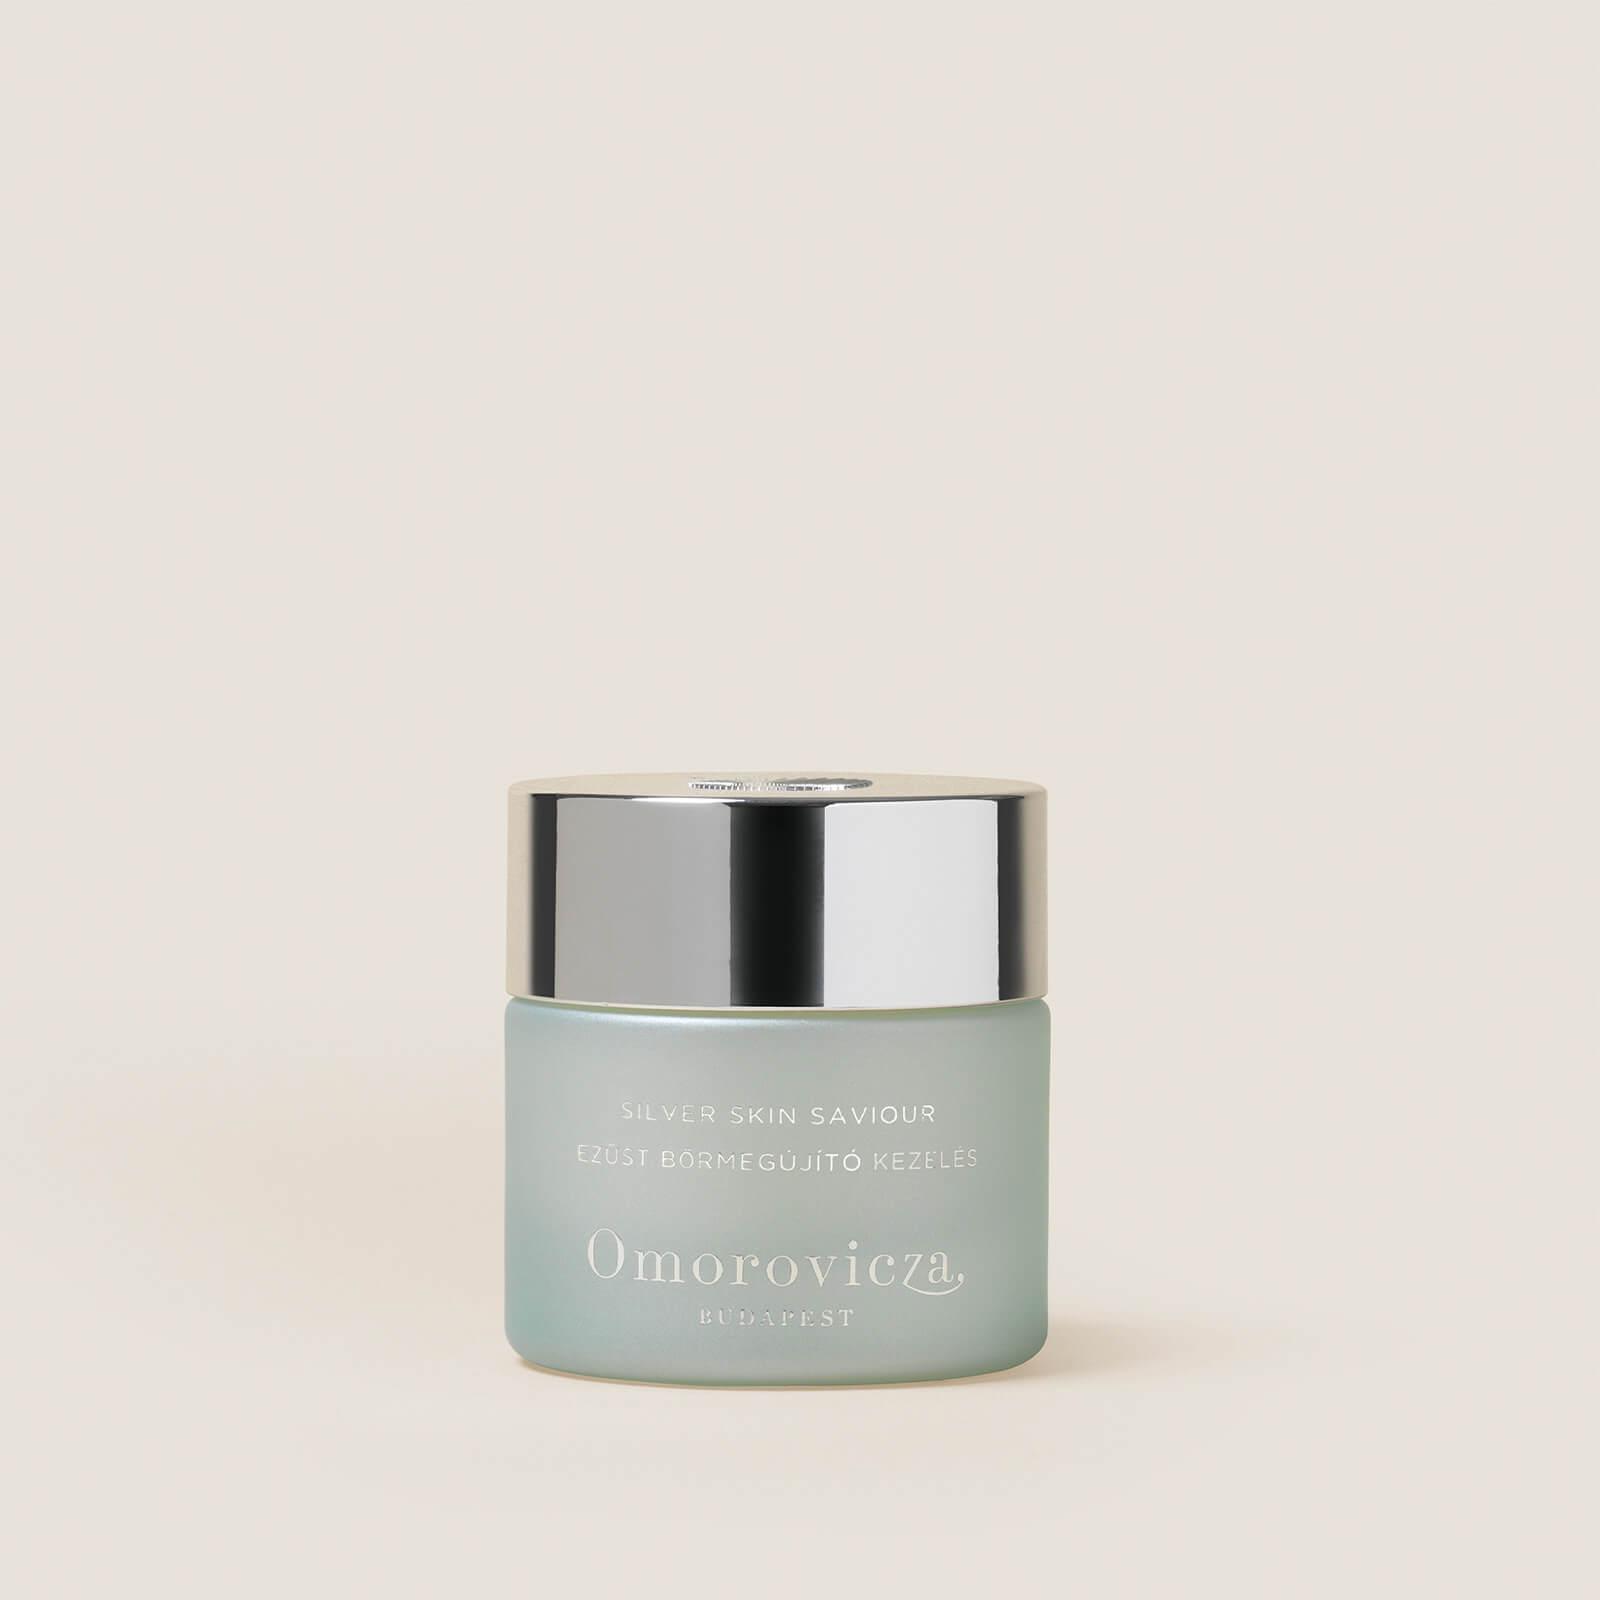 Купить Omorovicza Silver Skin Saviour 50ml